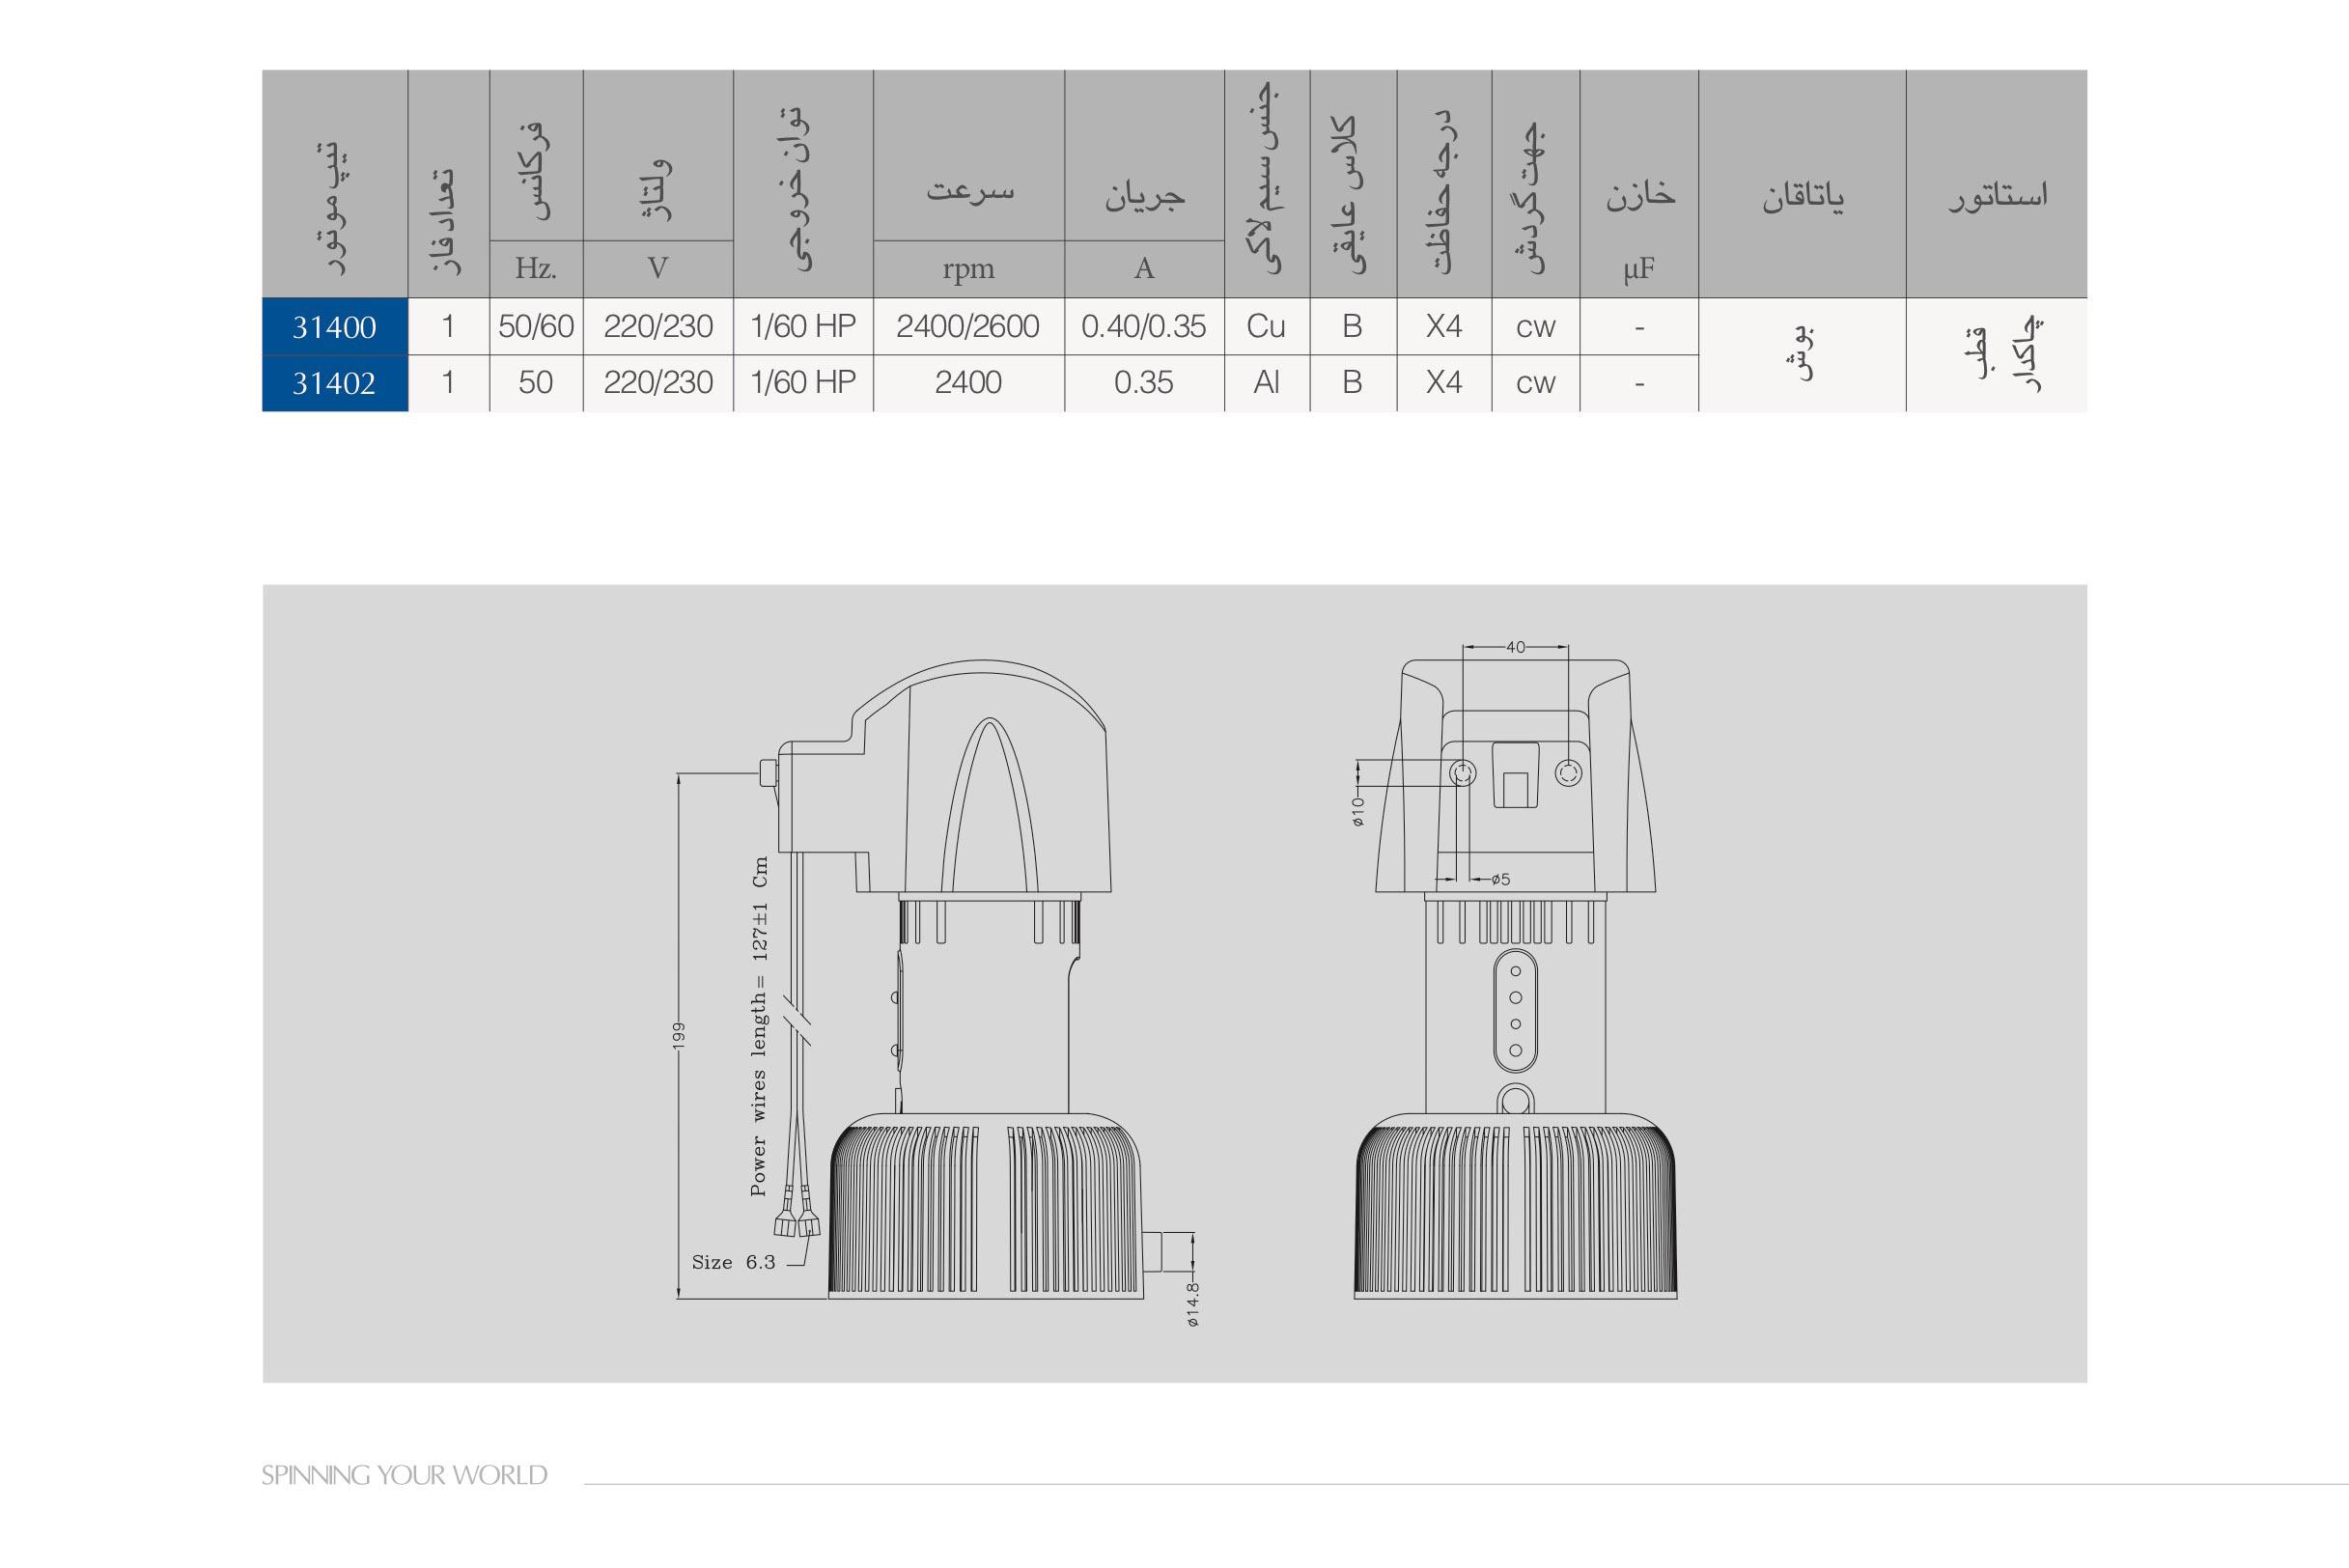 Cm Wiring Diagrams 220 230 3 50 Detailed Schematics Diagram Alvand